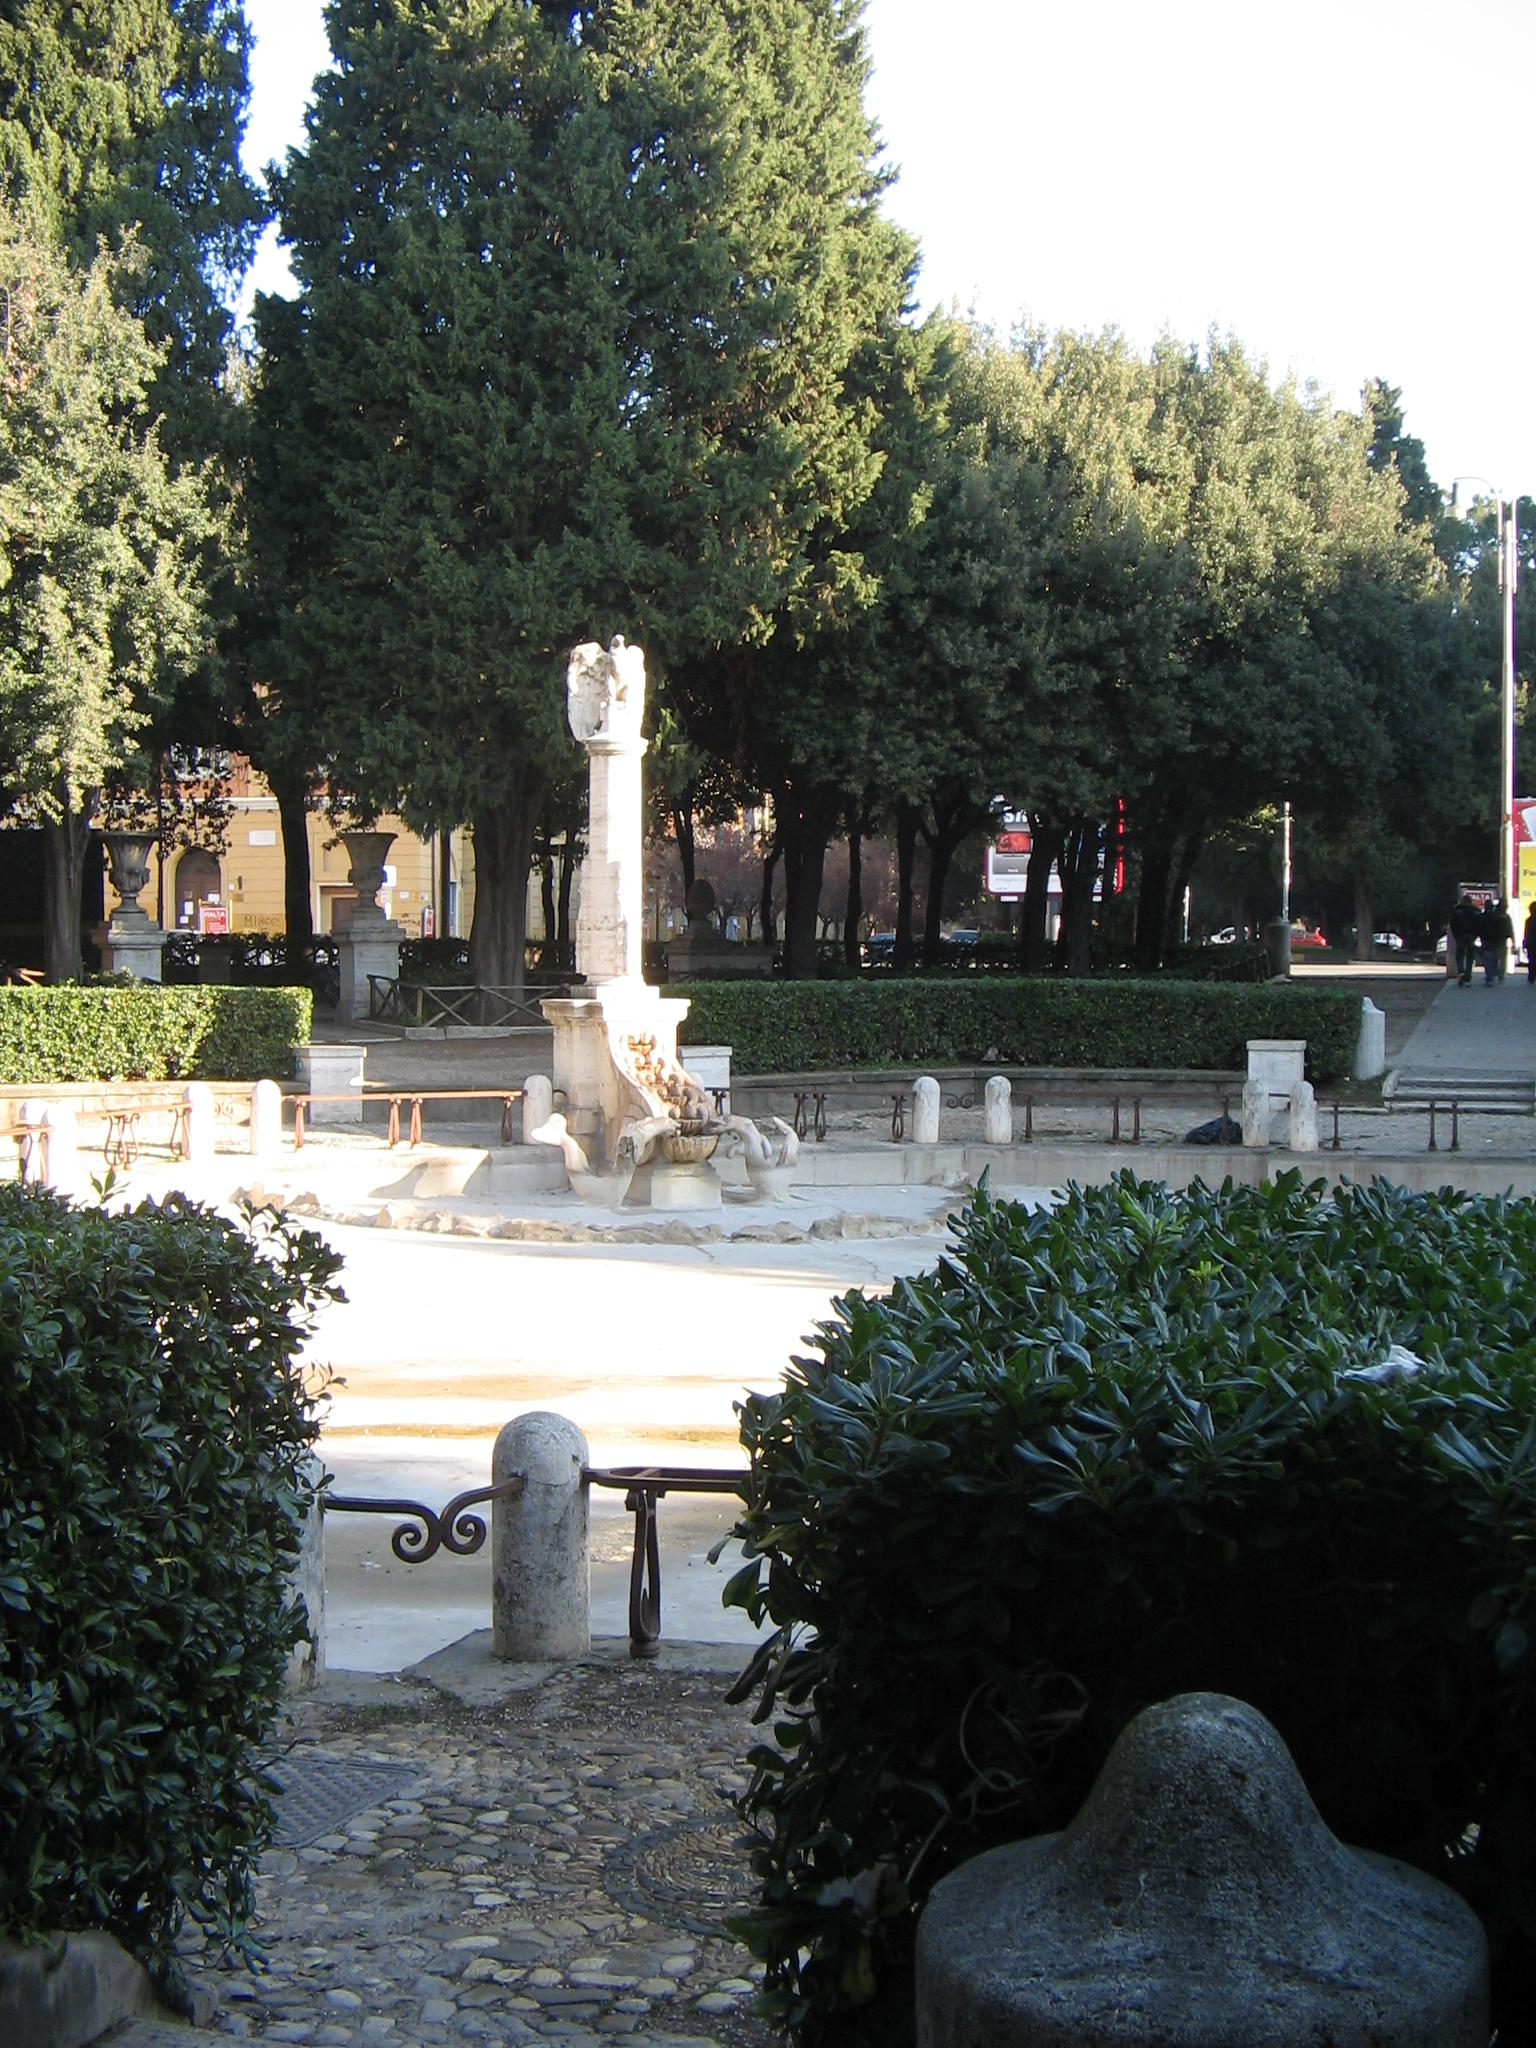 Elegant File:Piazza Mazzini (Roma) 2.JPG